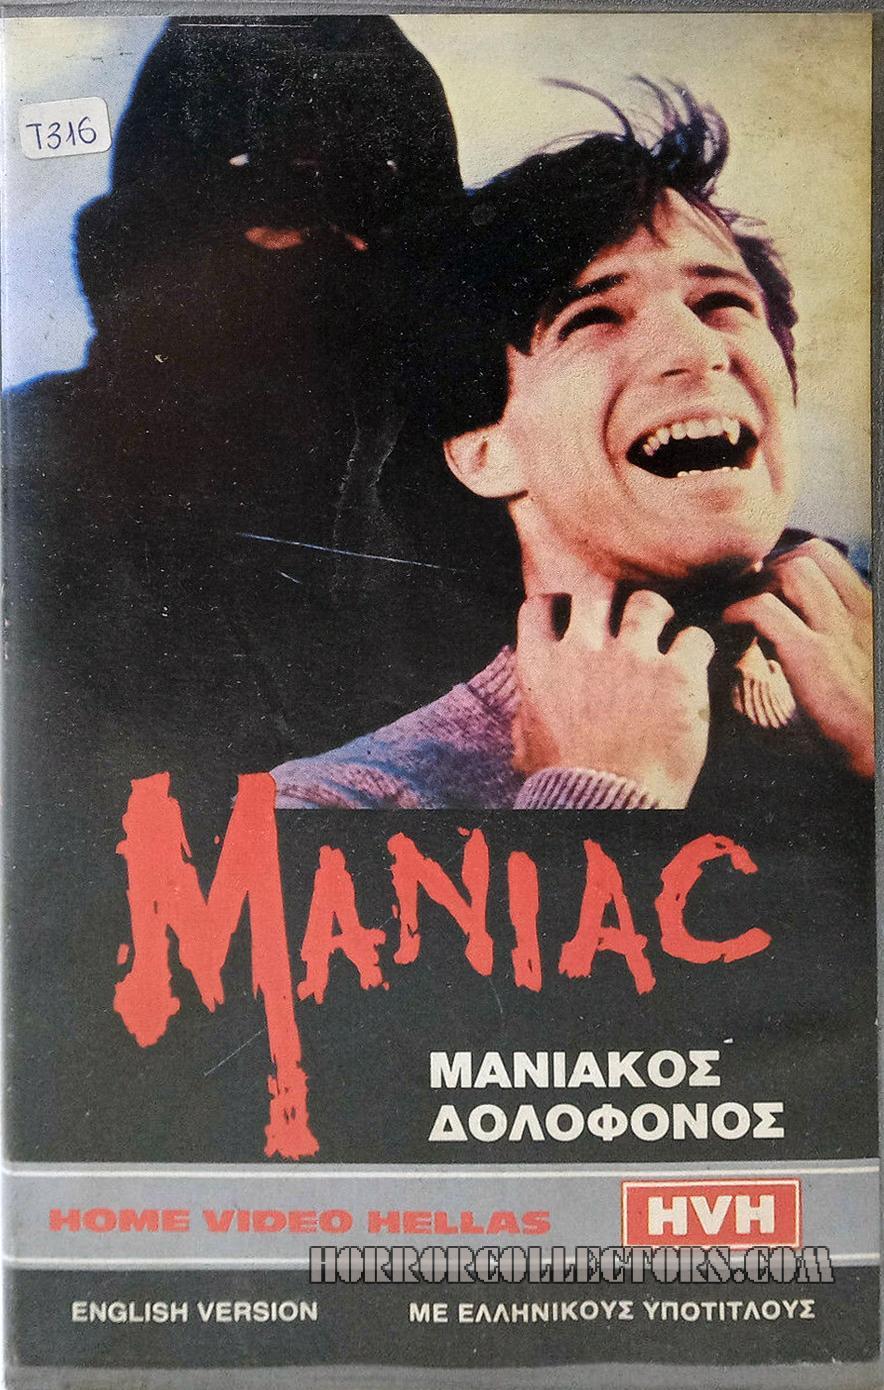 Maniac GREEK HVH VHS Video